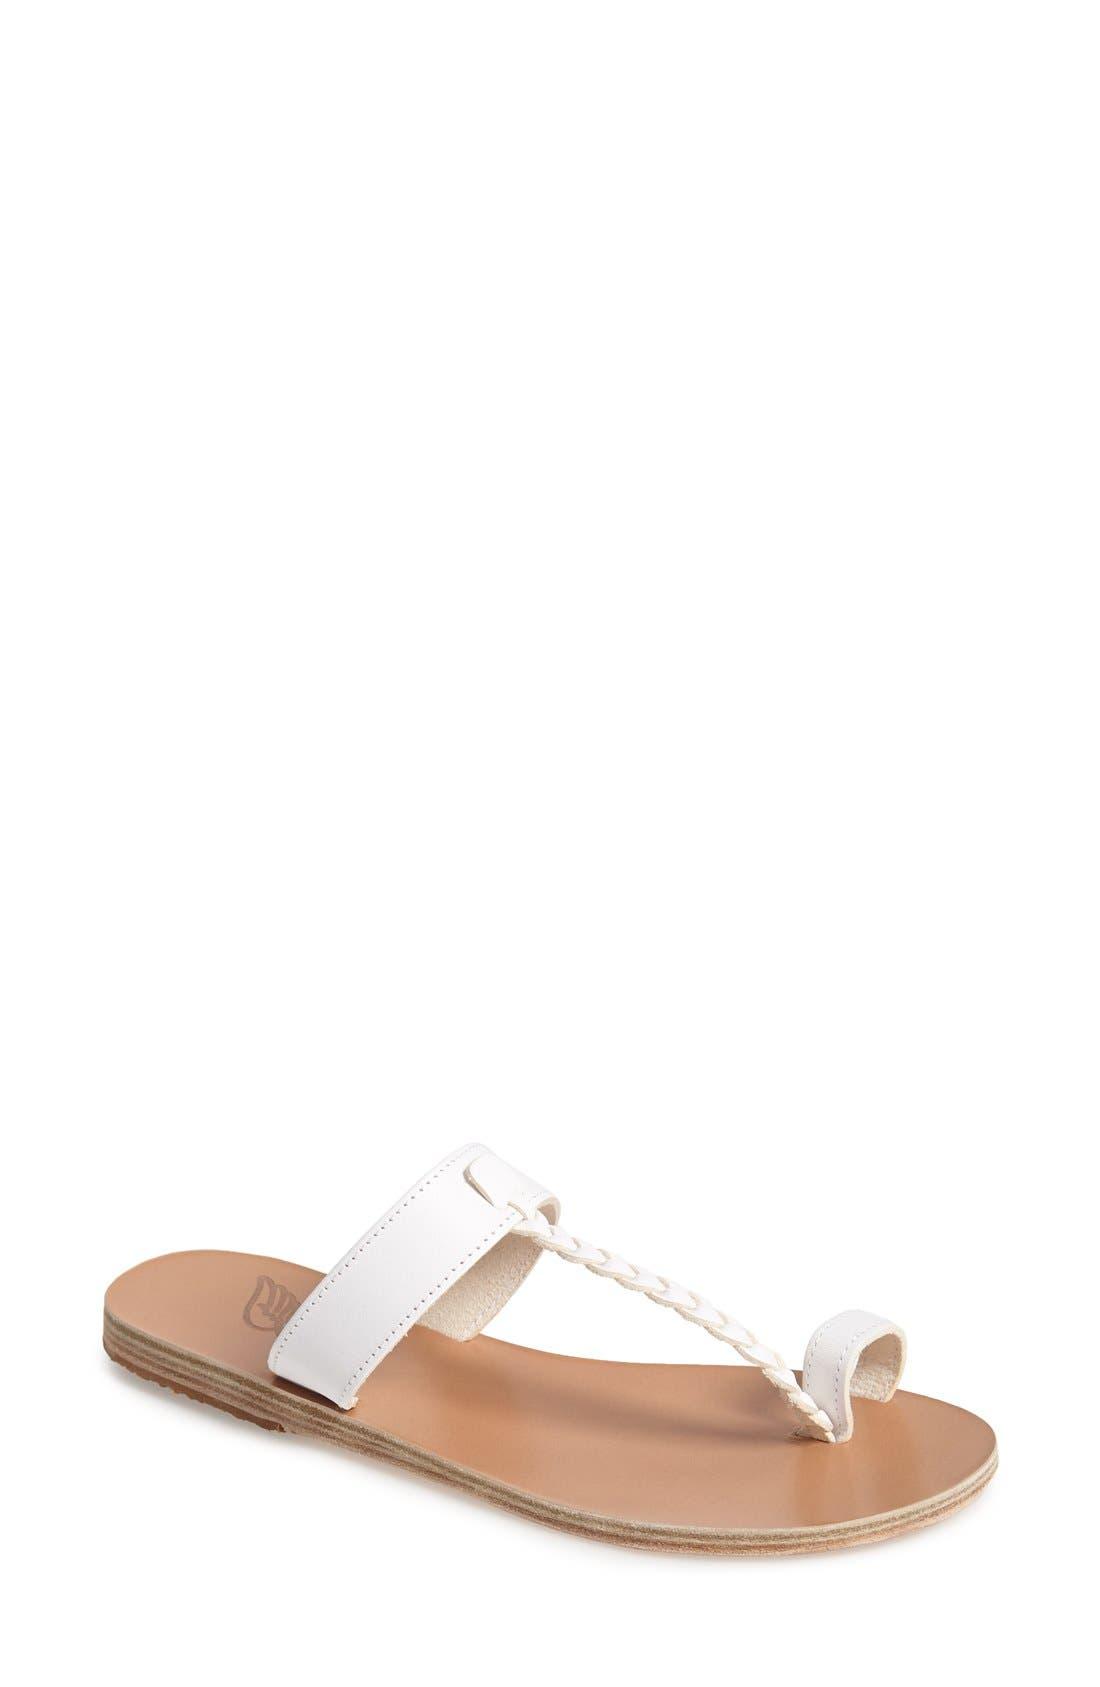 Main Image - Ancient Greek Sandals 'Melpomeni' Leather Sandal (Women)